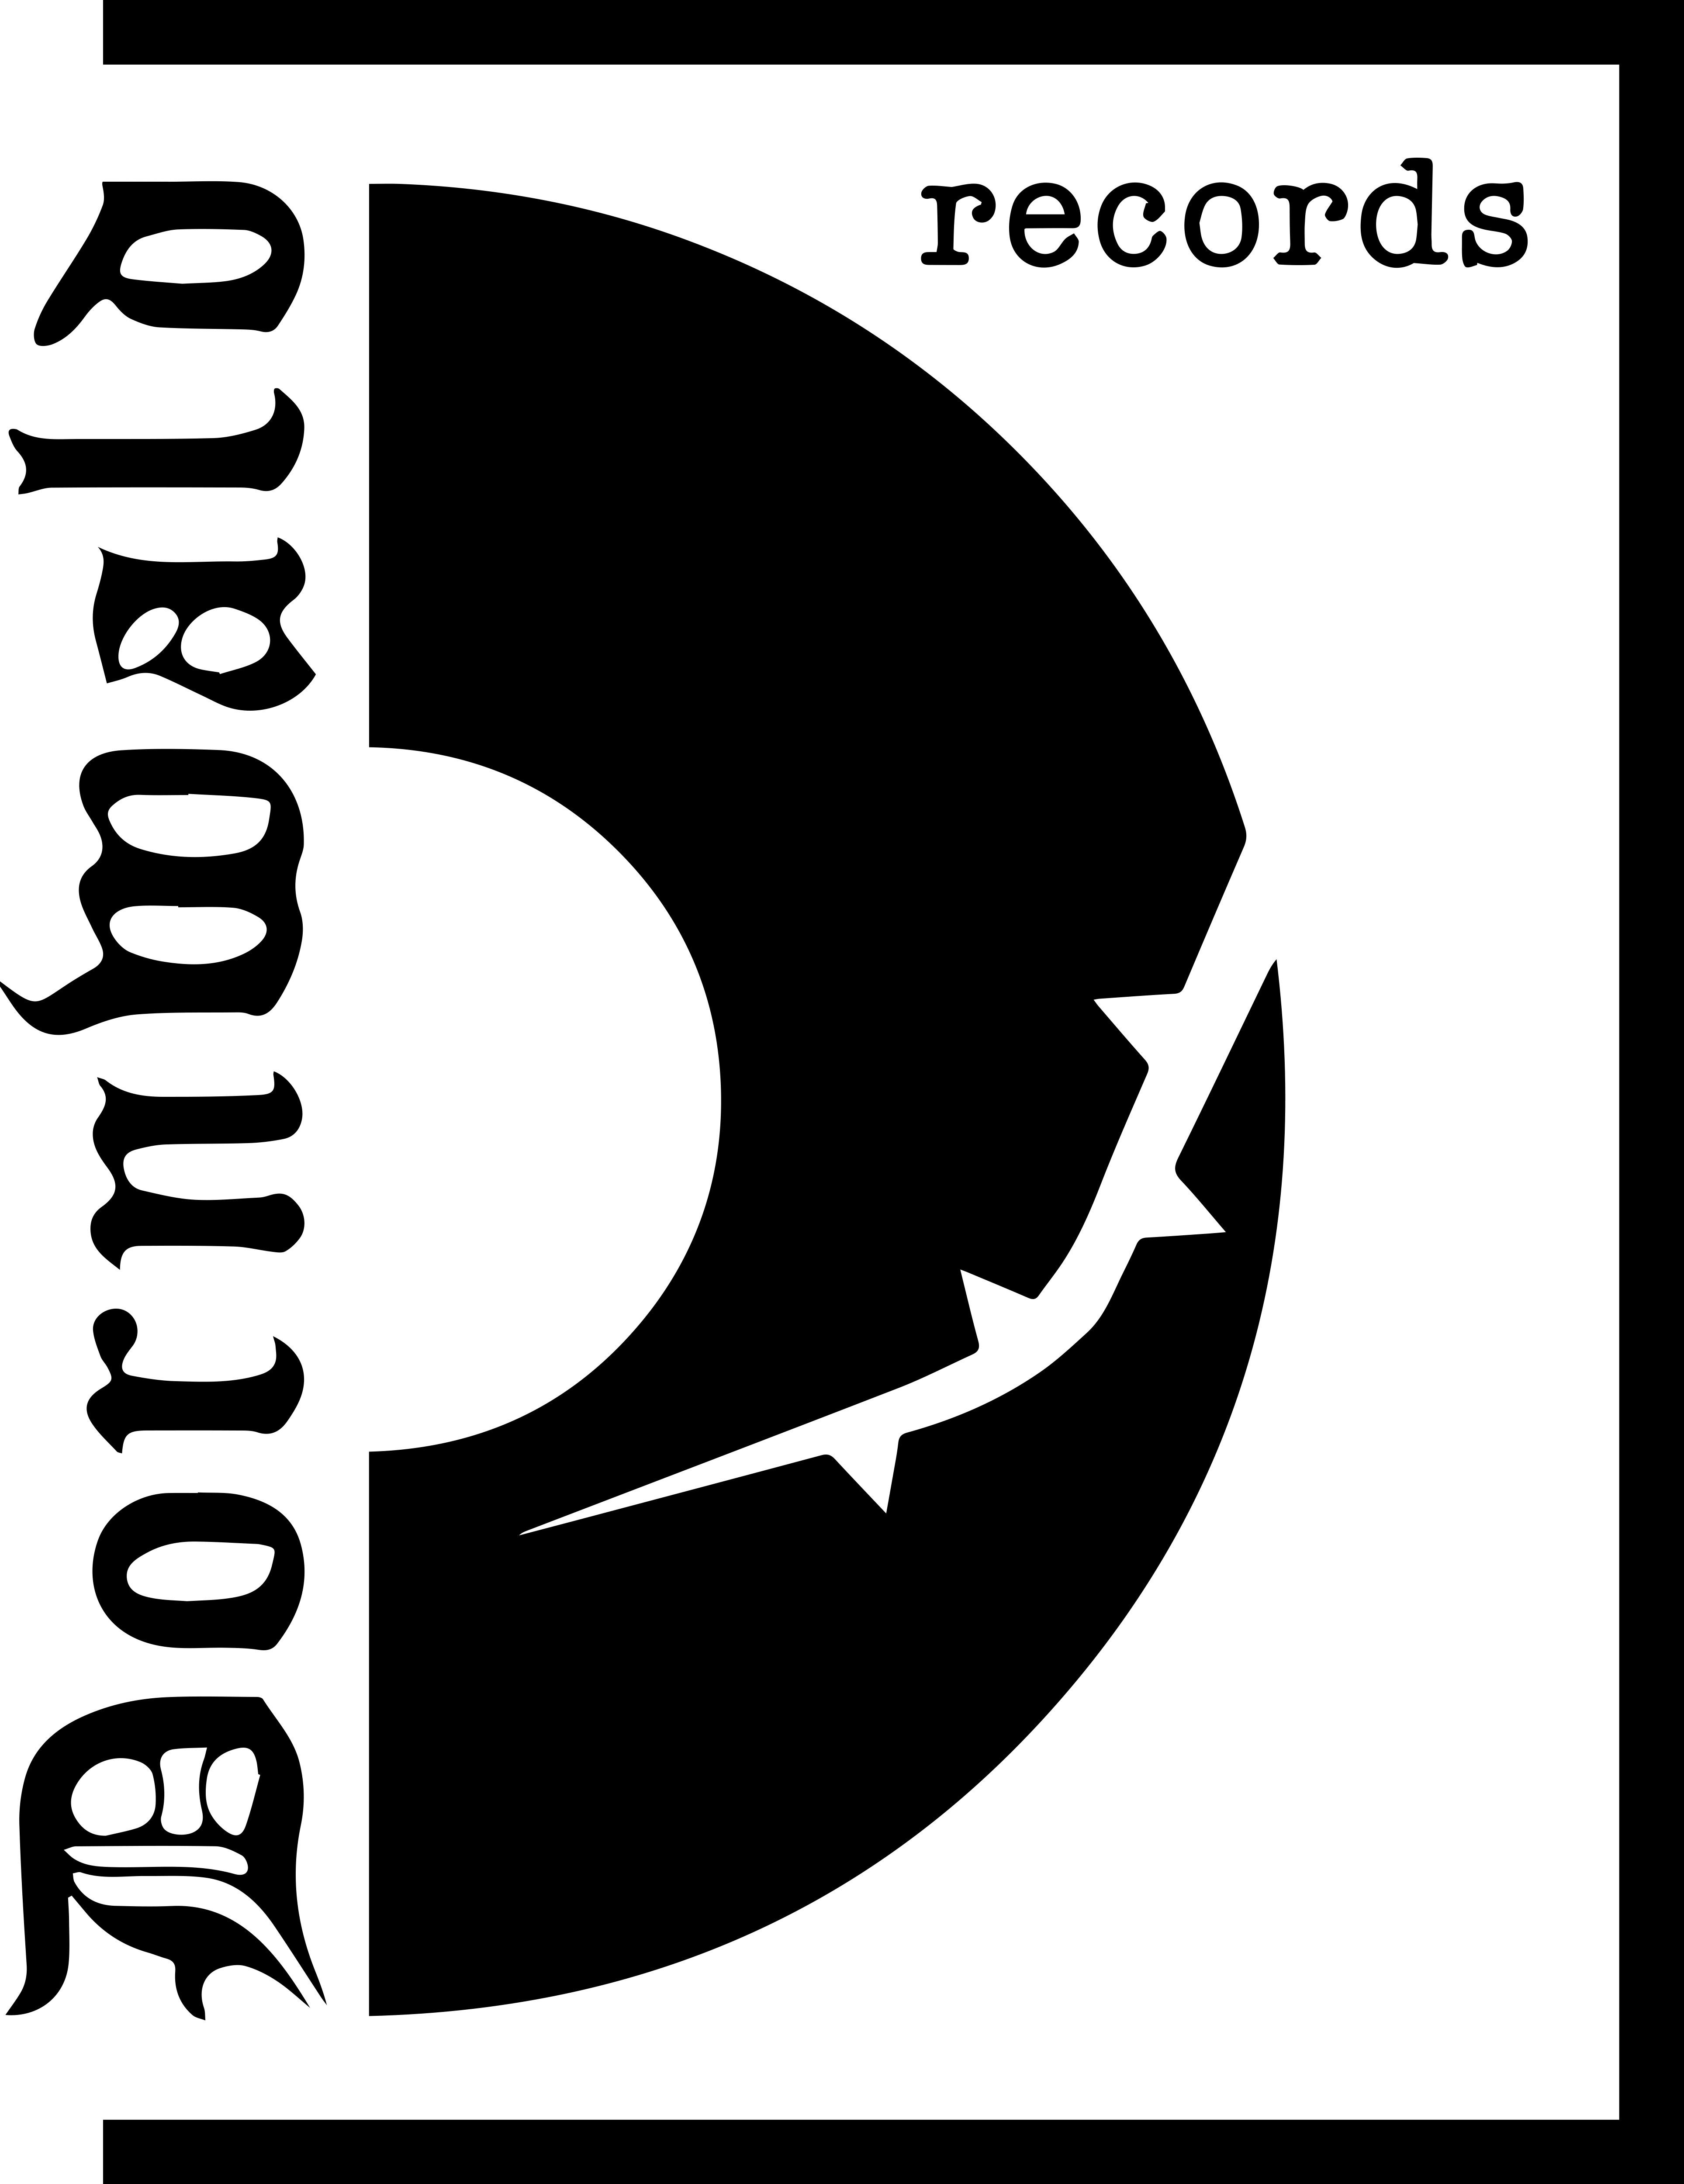 Dornwald Records